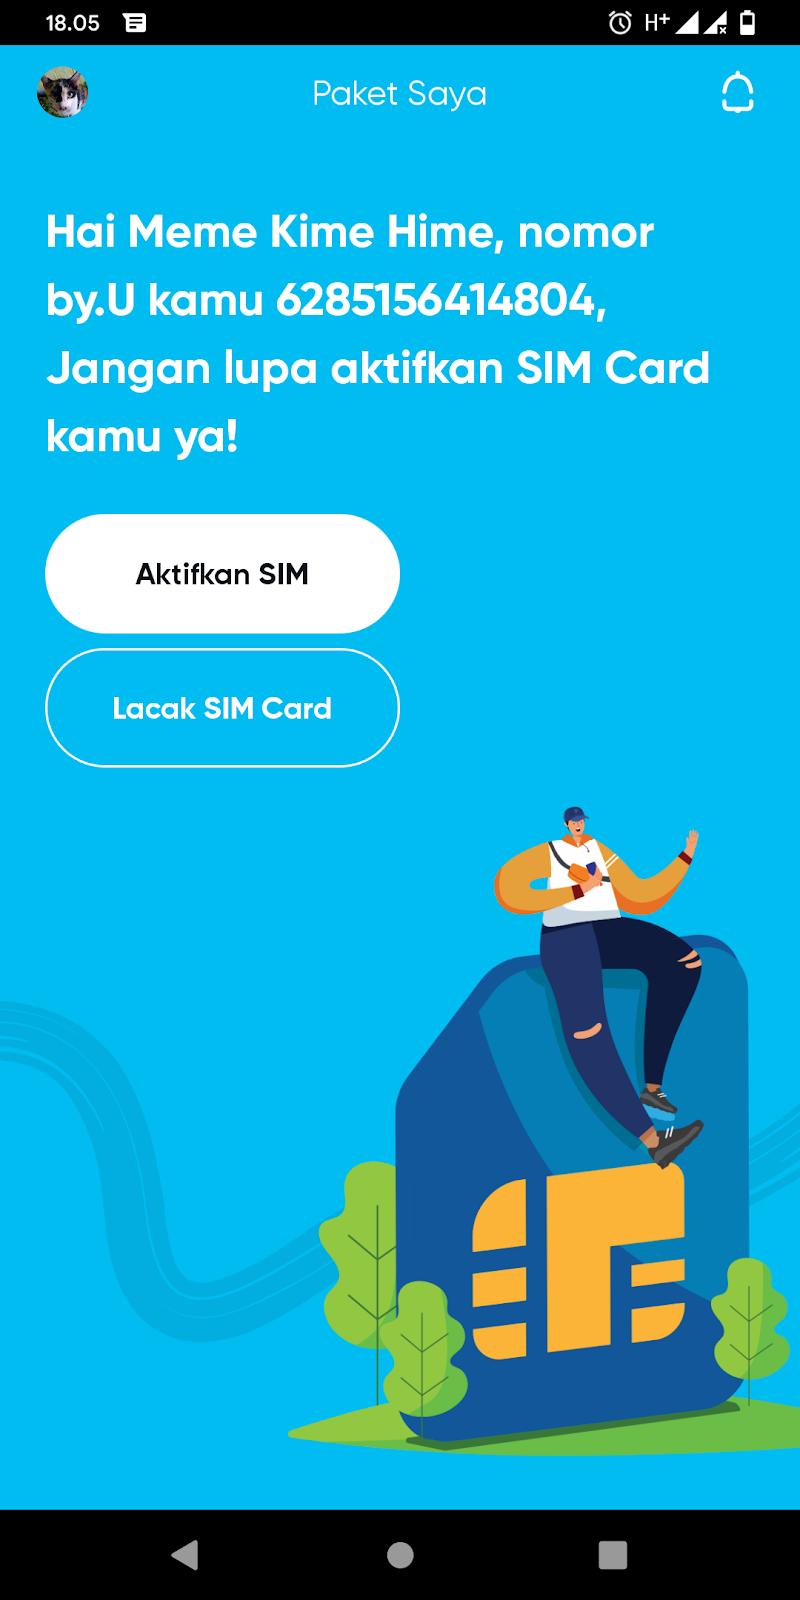 Cara Registrasi Kartu Perdana by.U Telkomsel